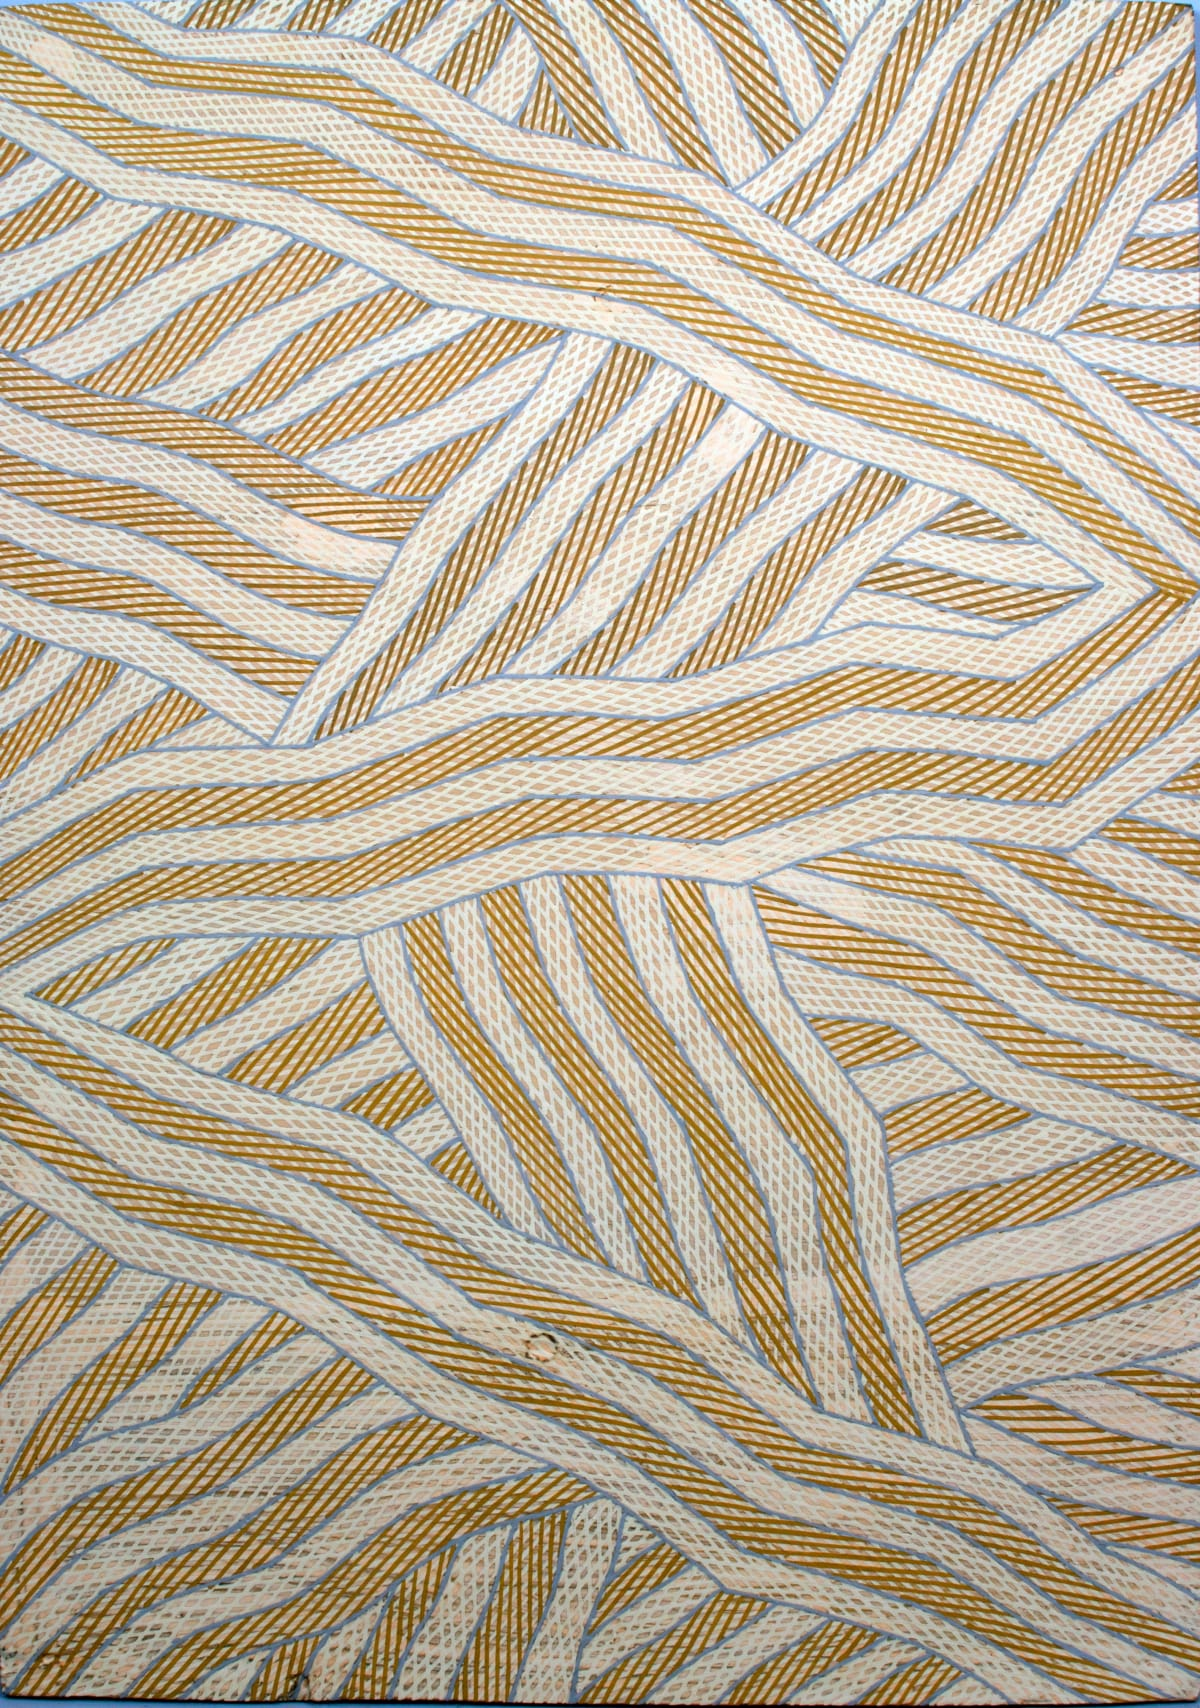 Manini Gumana Garraparra natural ochre and pigment on plywood 52 x 75 cm